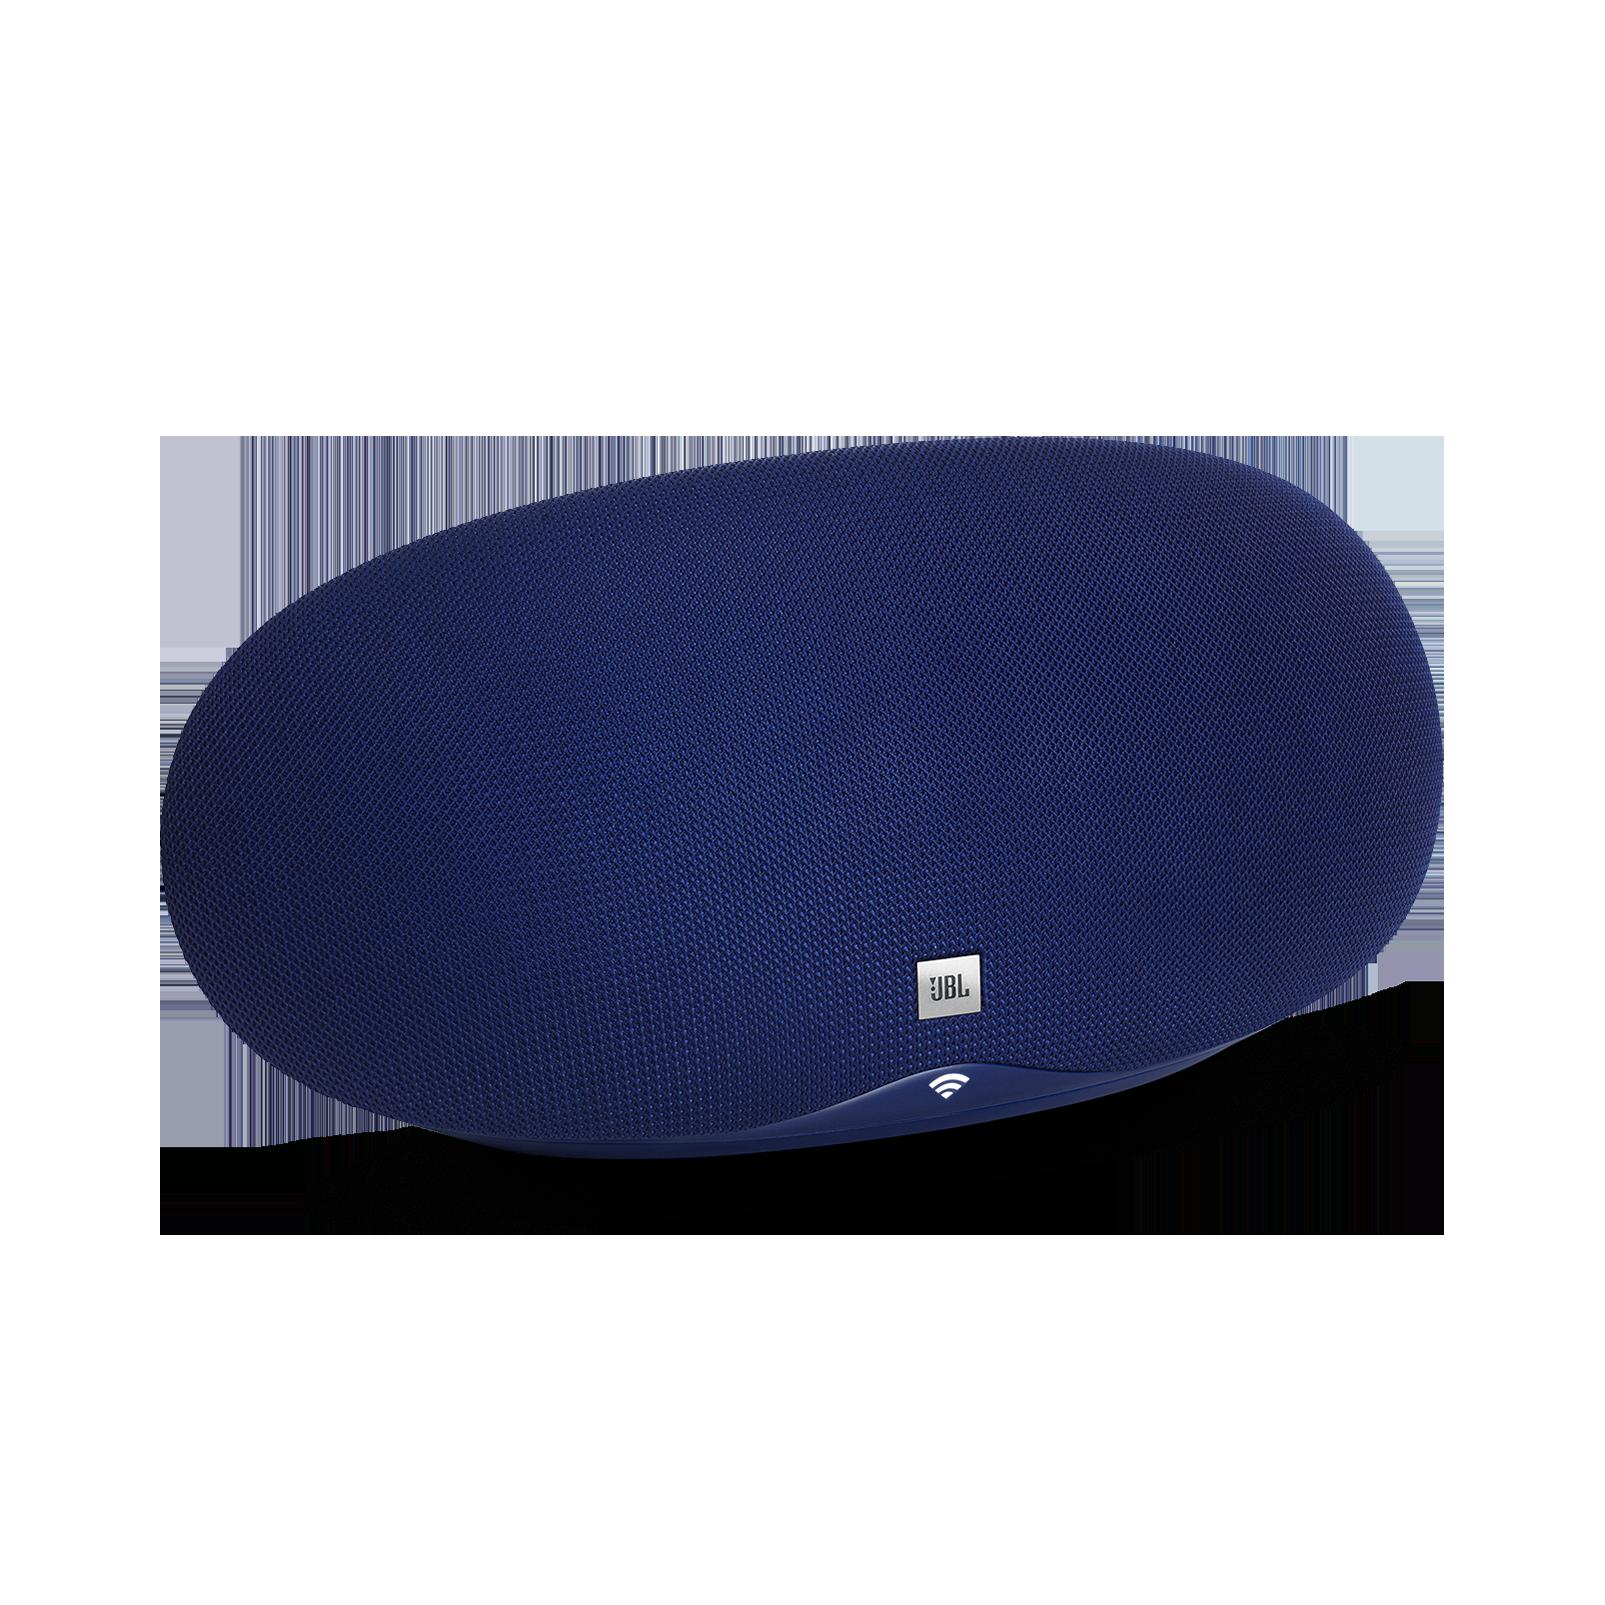 JBL Playlist - Blue - Wireless speaker with Chromecast built-in - Hero